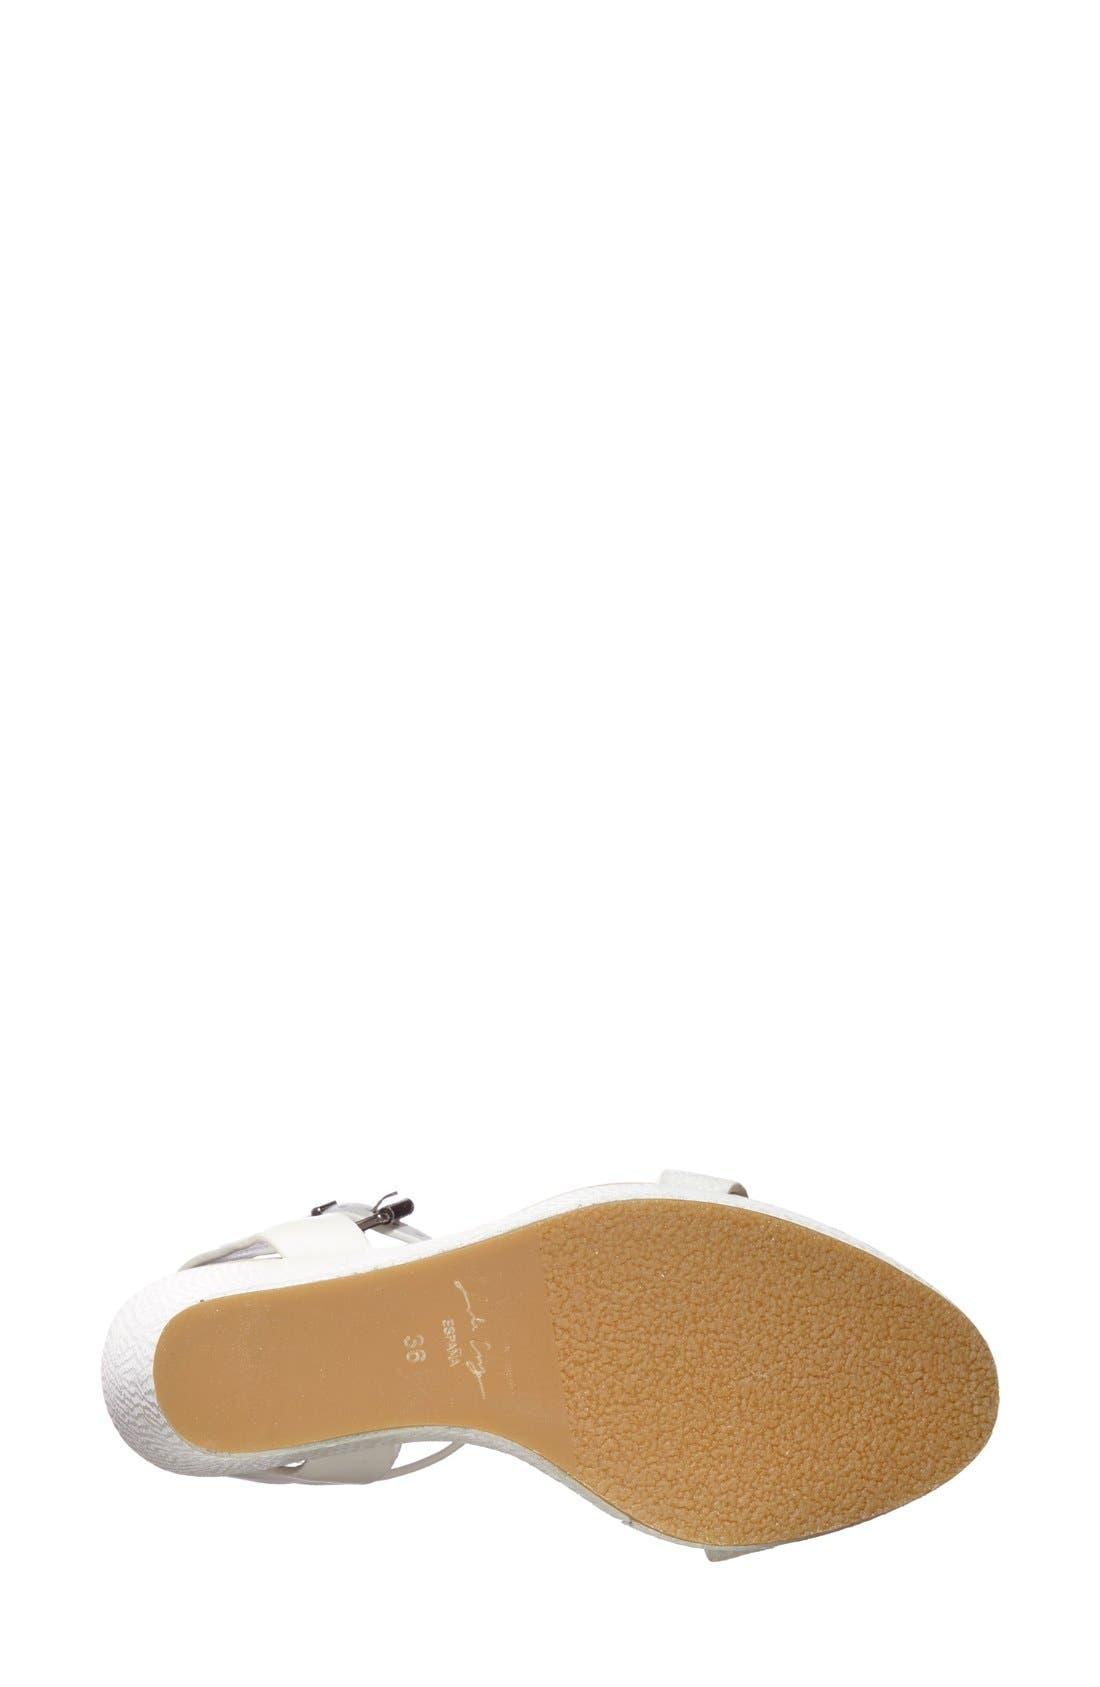 Alternate Image 2  - Lola Cruz Chain T-Strap Wedge Sandal (Women)